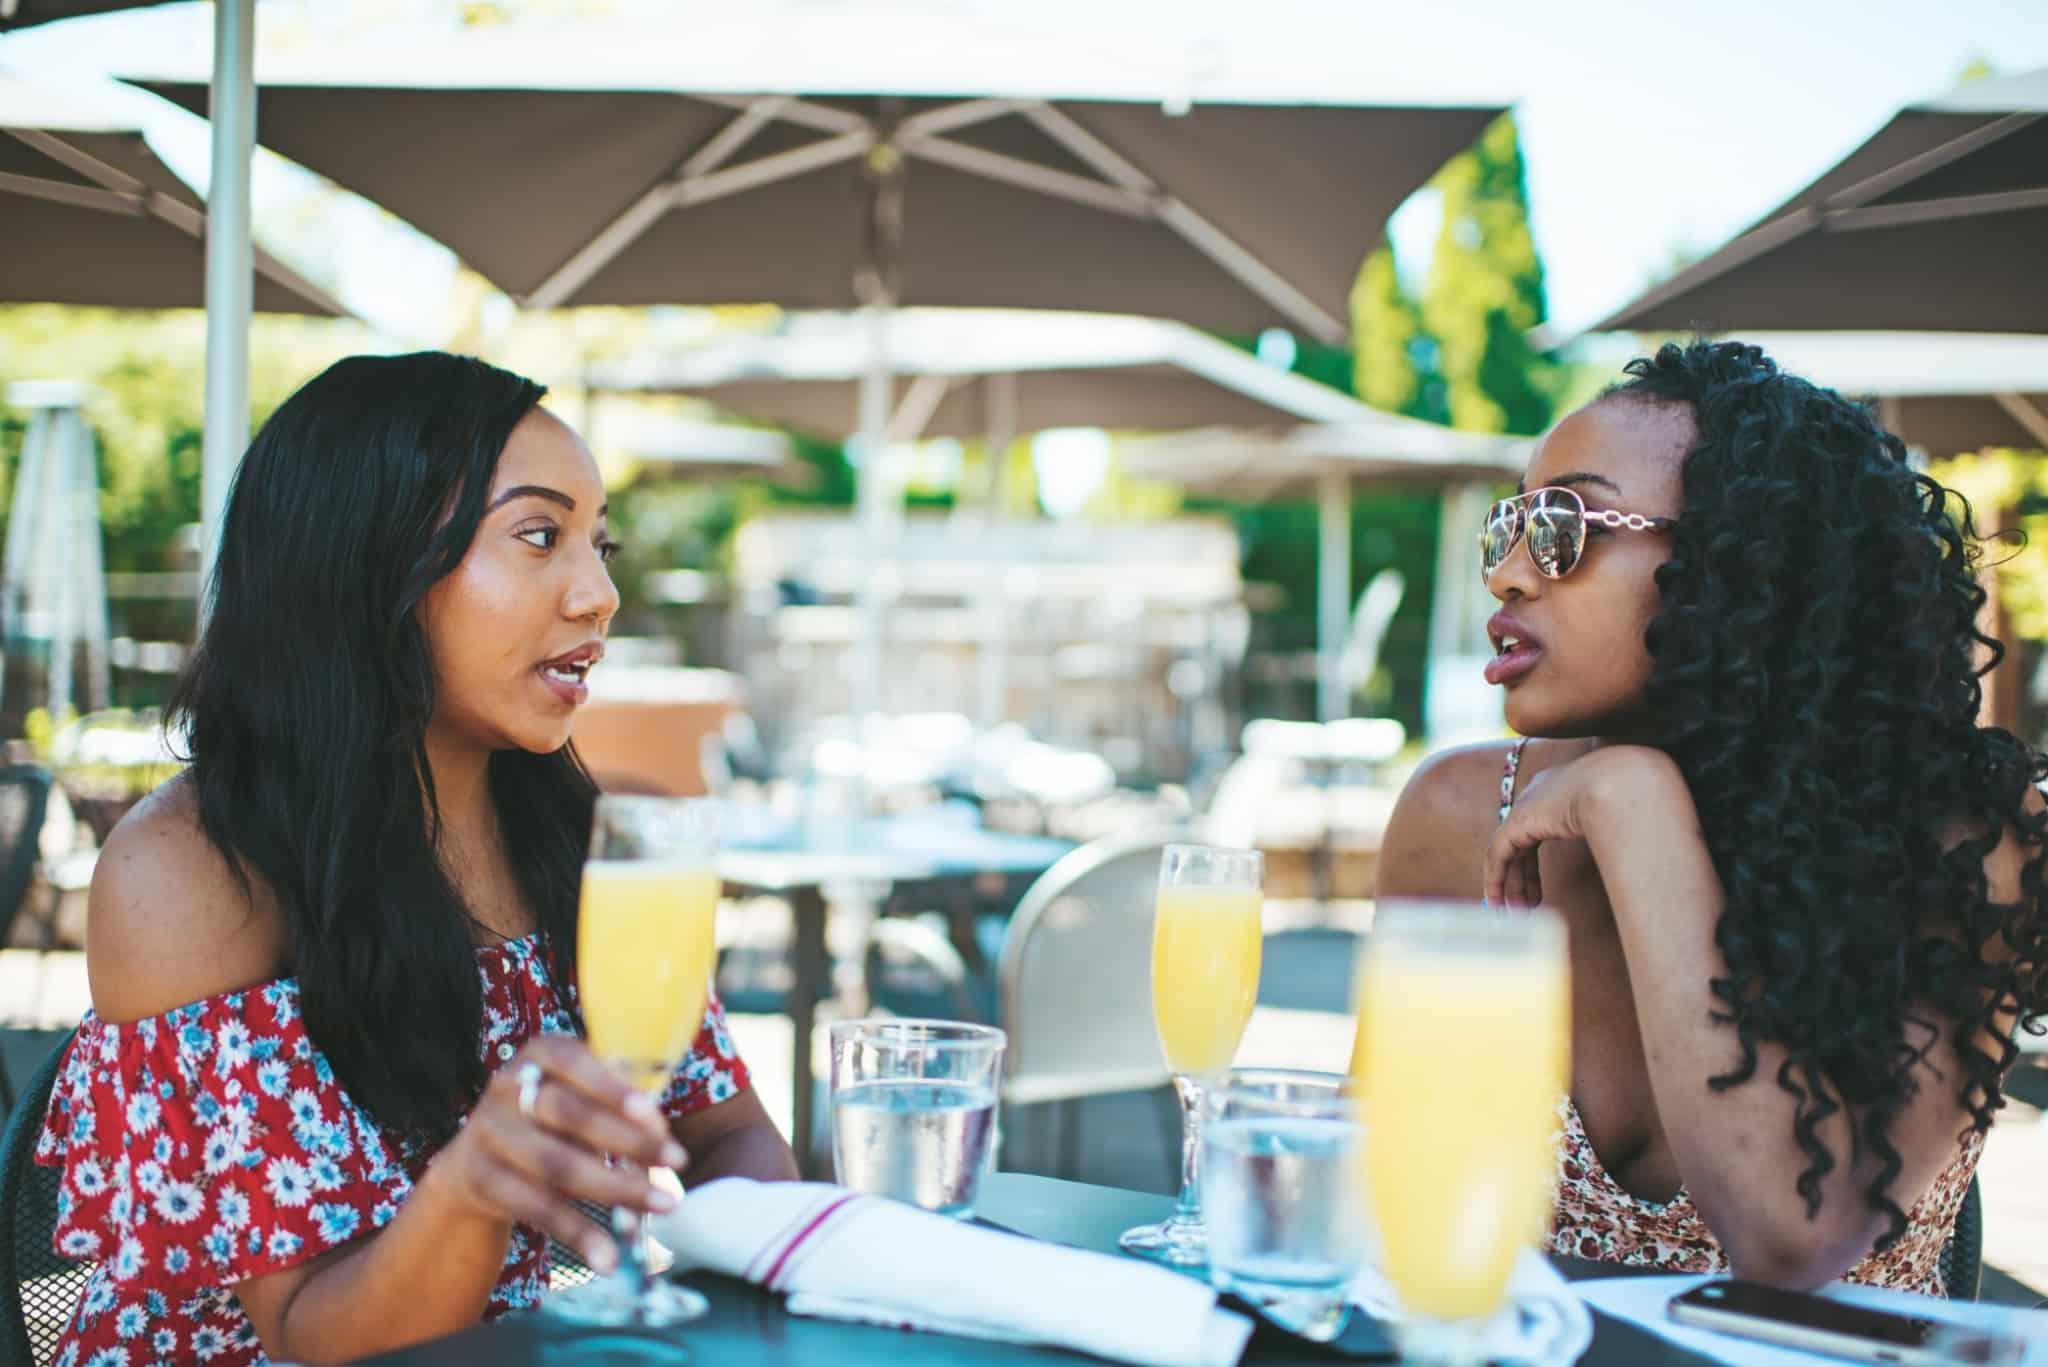 IWD-girl-friends-having-a-conversation_t20_Qa2orb-scaled.jpg